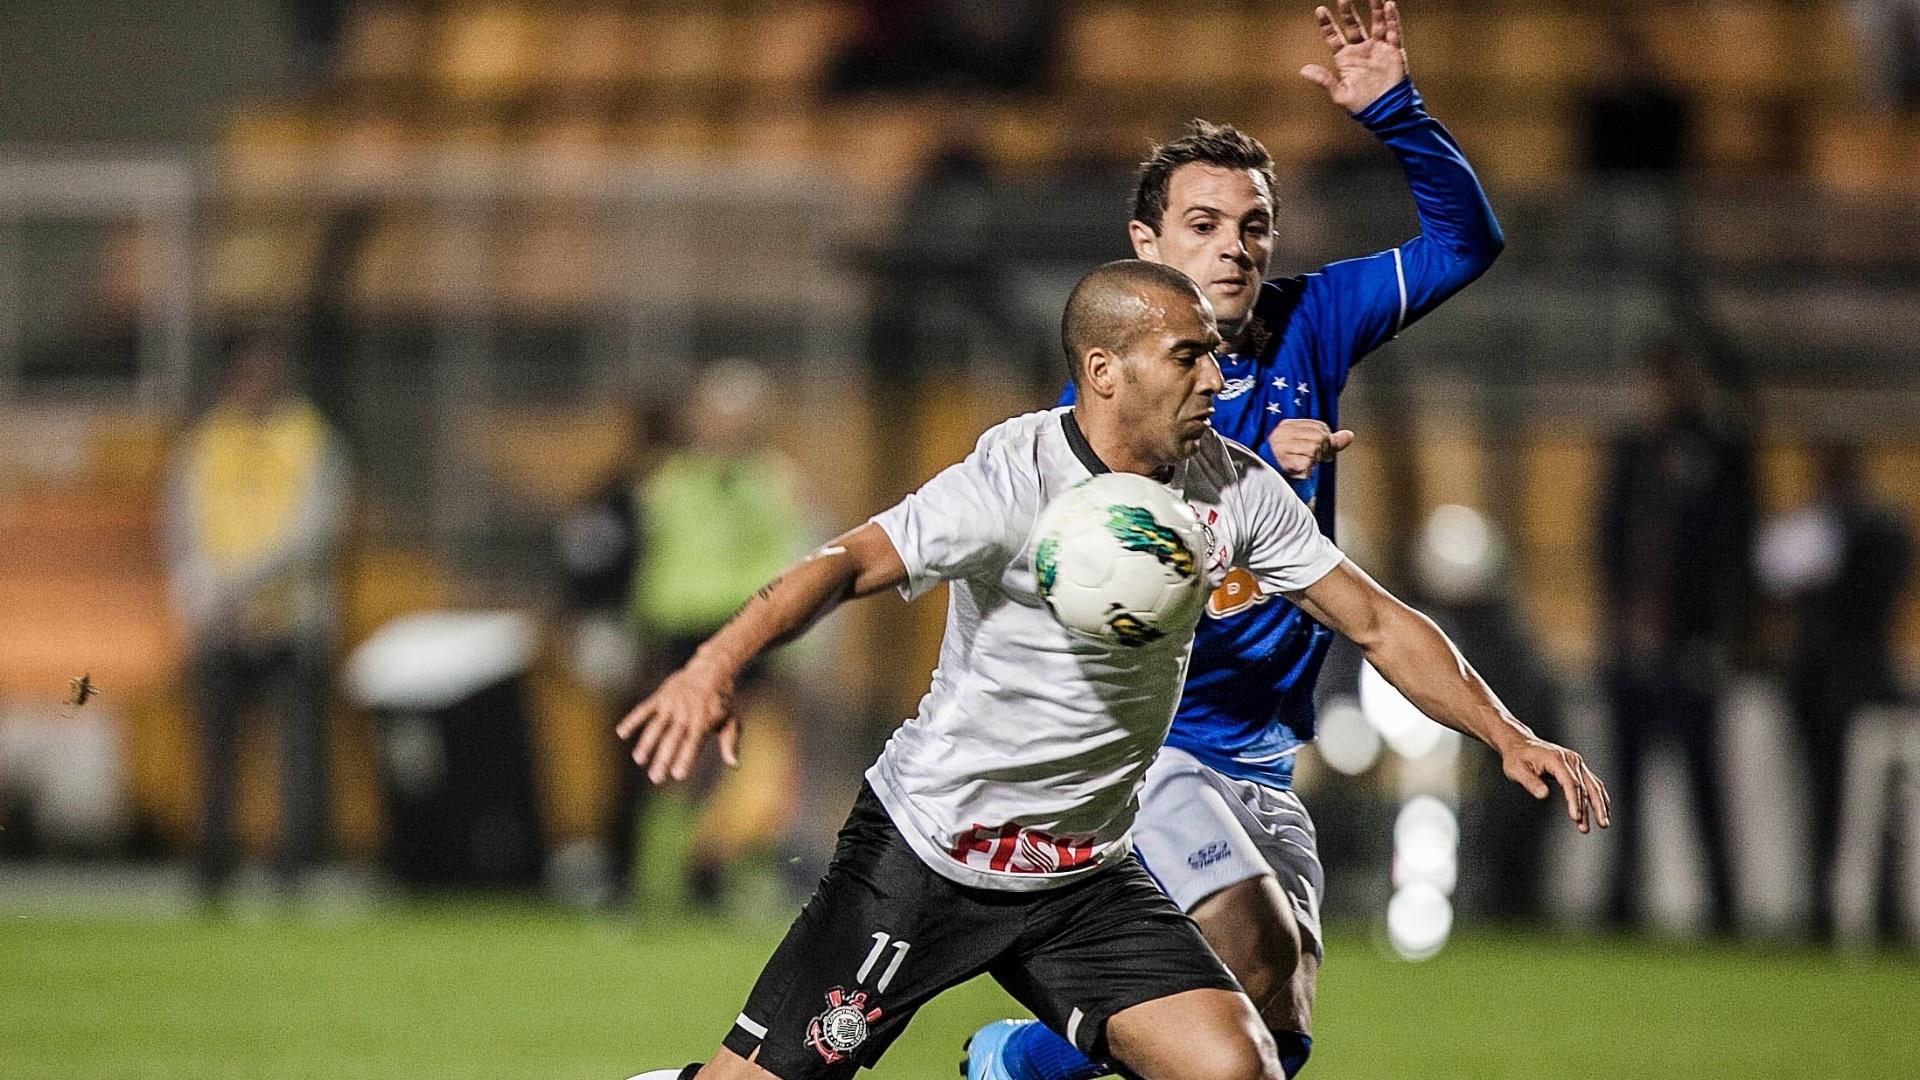 Emerson Sheik trava belo duelo com argentino Montillo e tenta proteger a bola